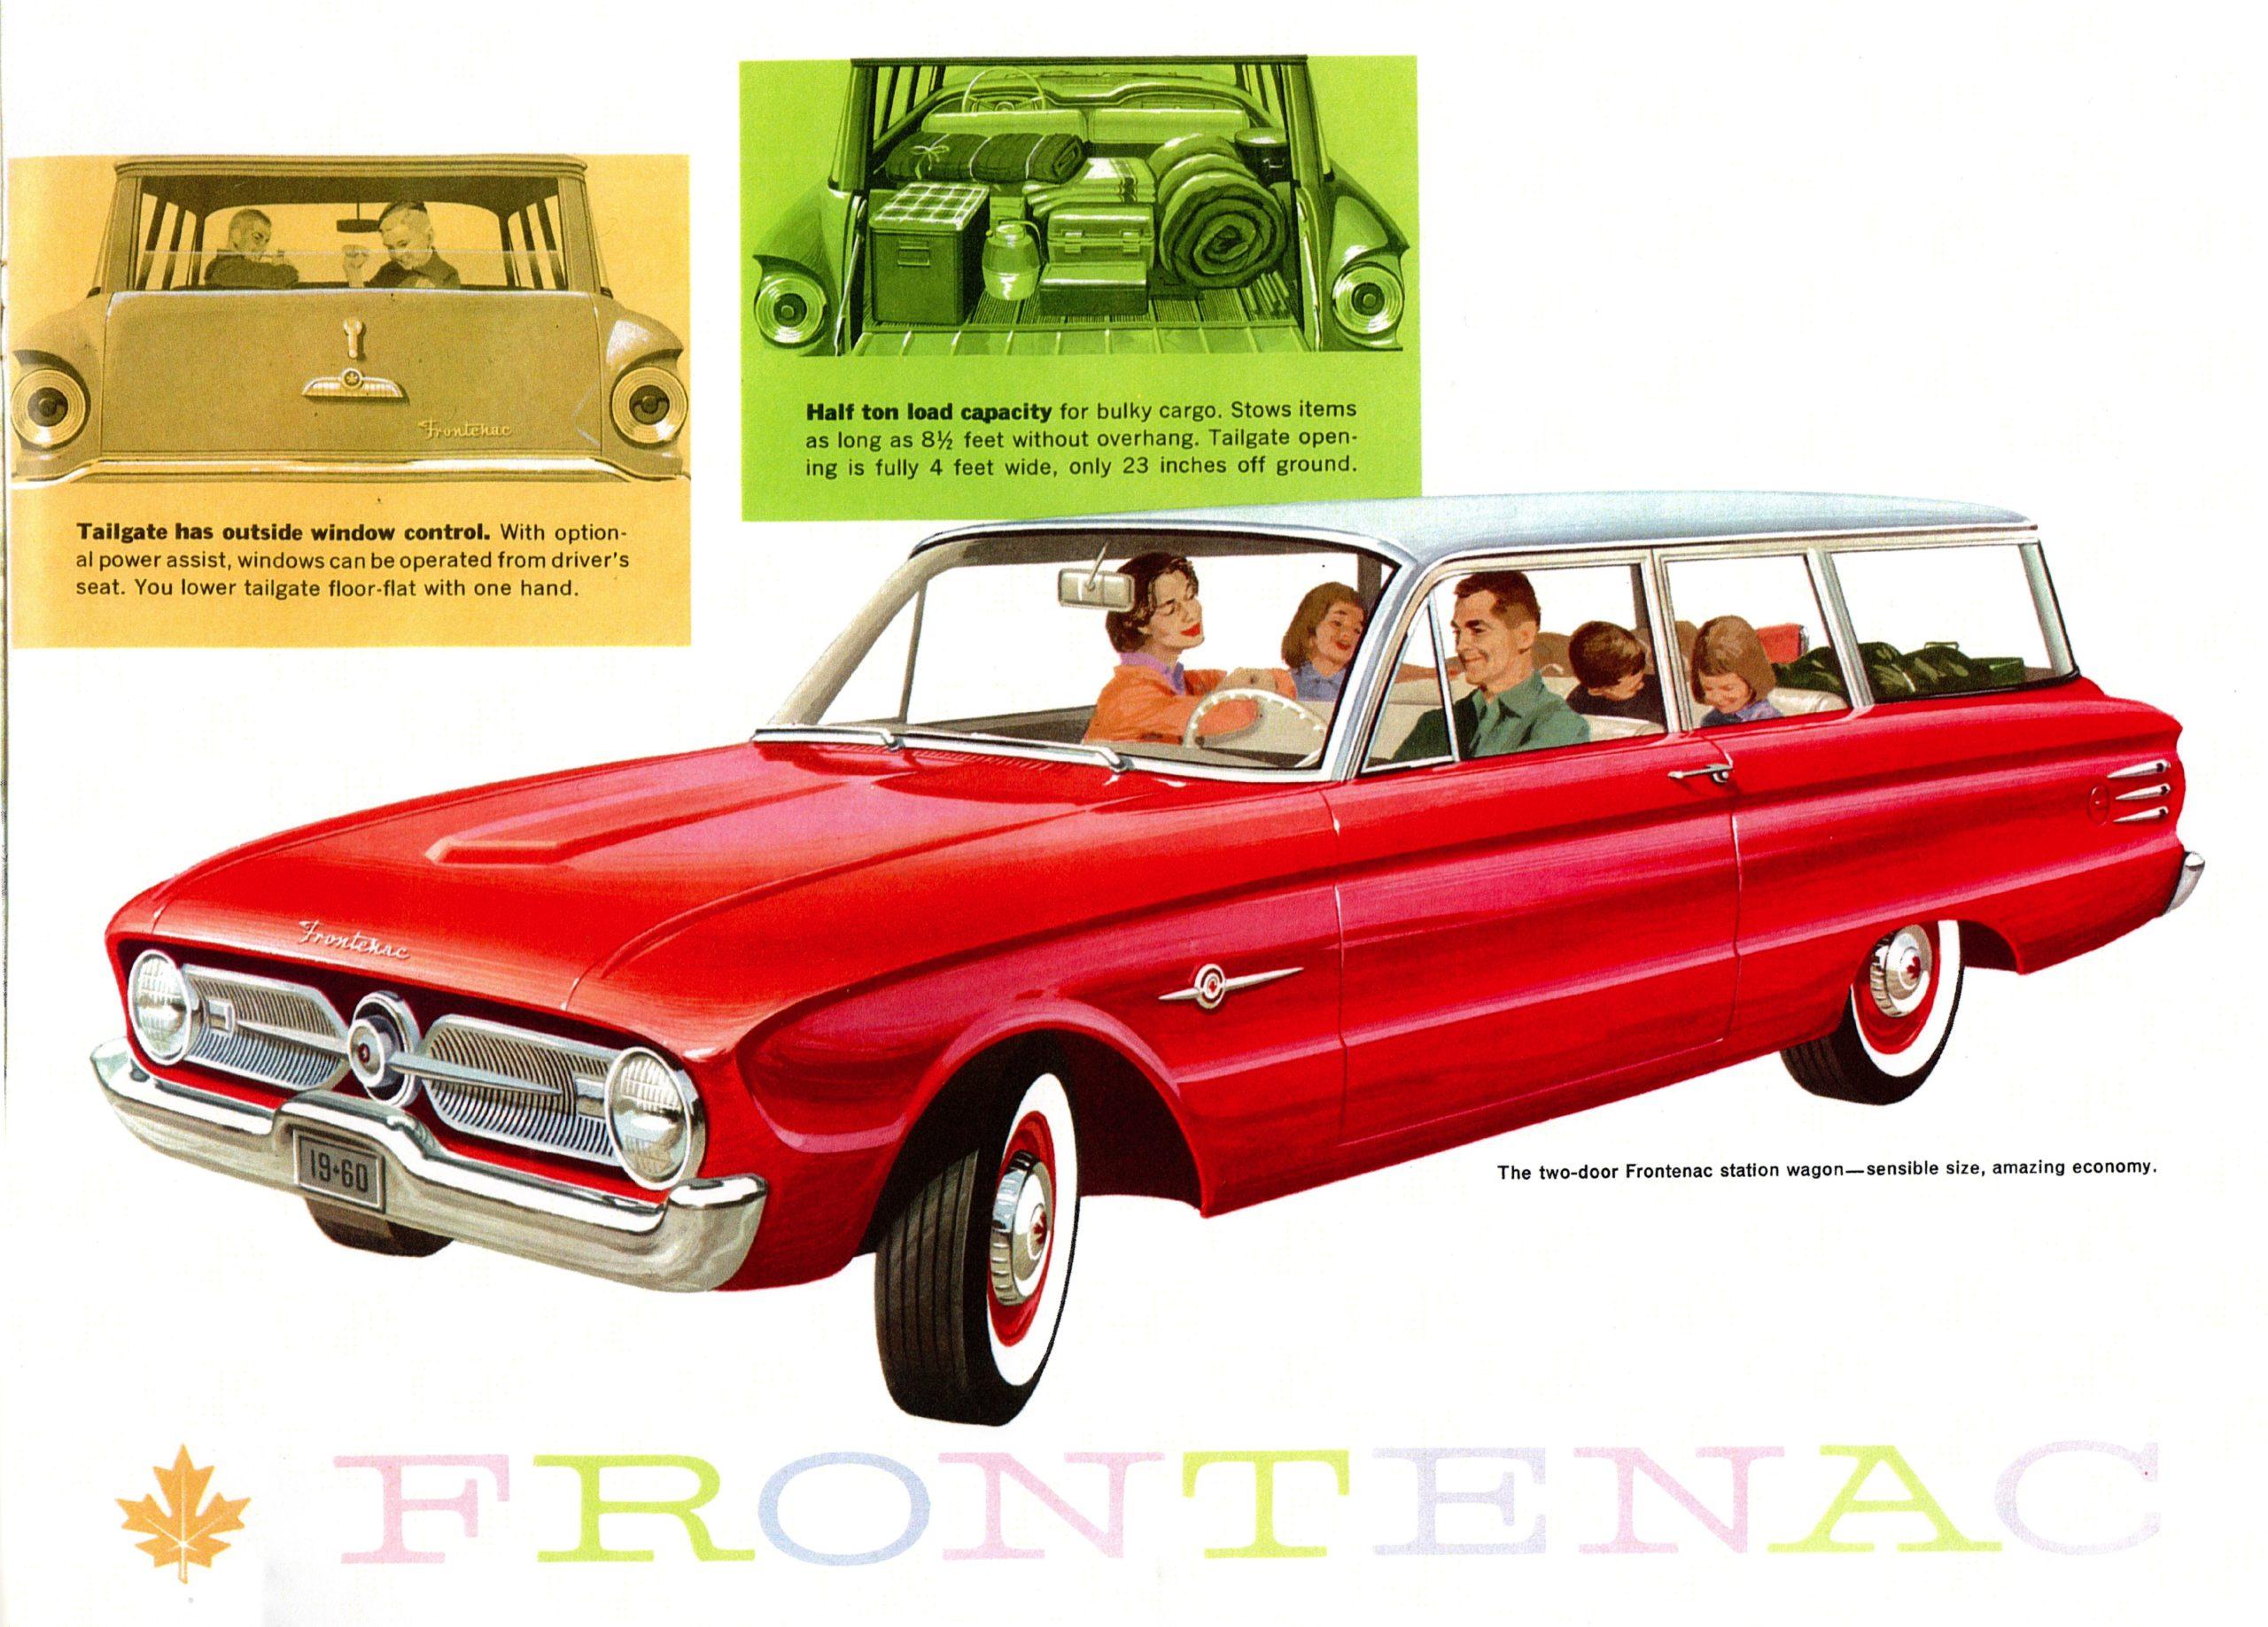 Car advertisement from 1960. Long description available.